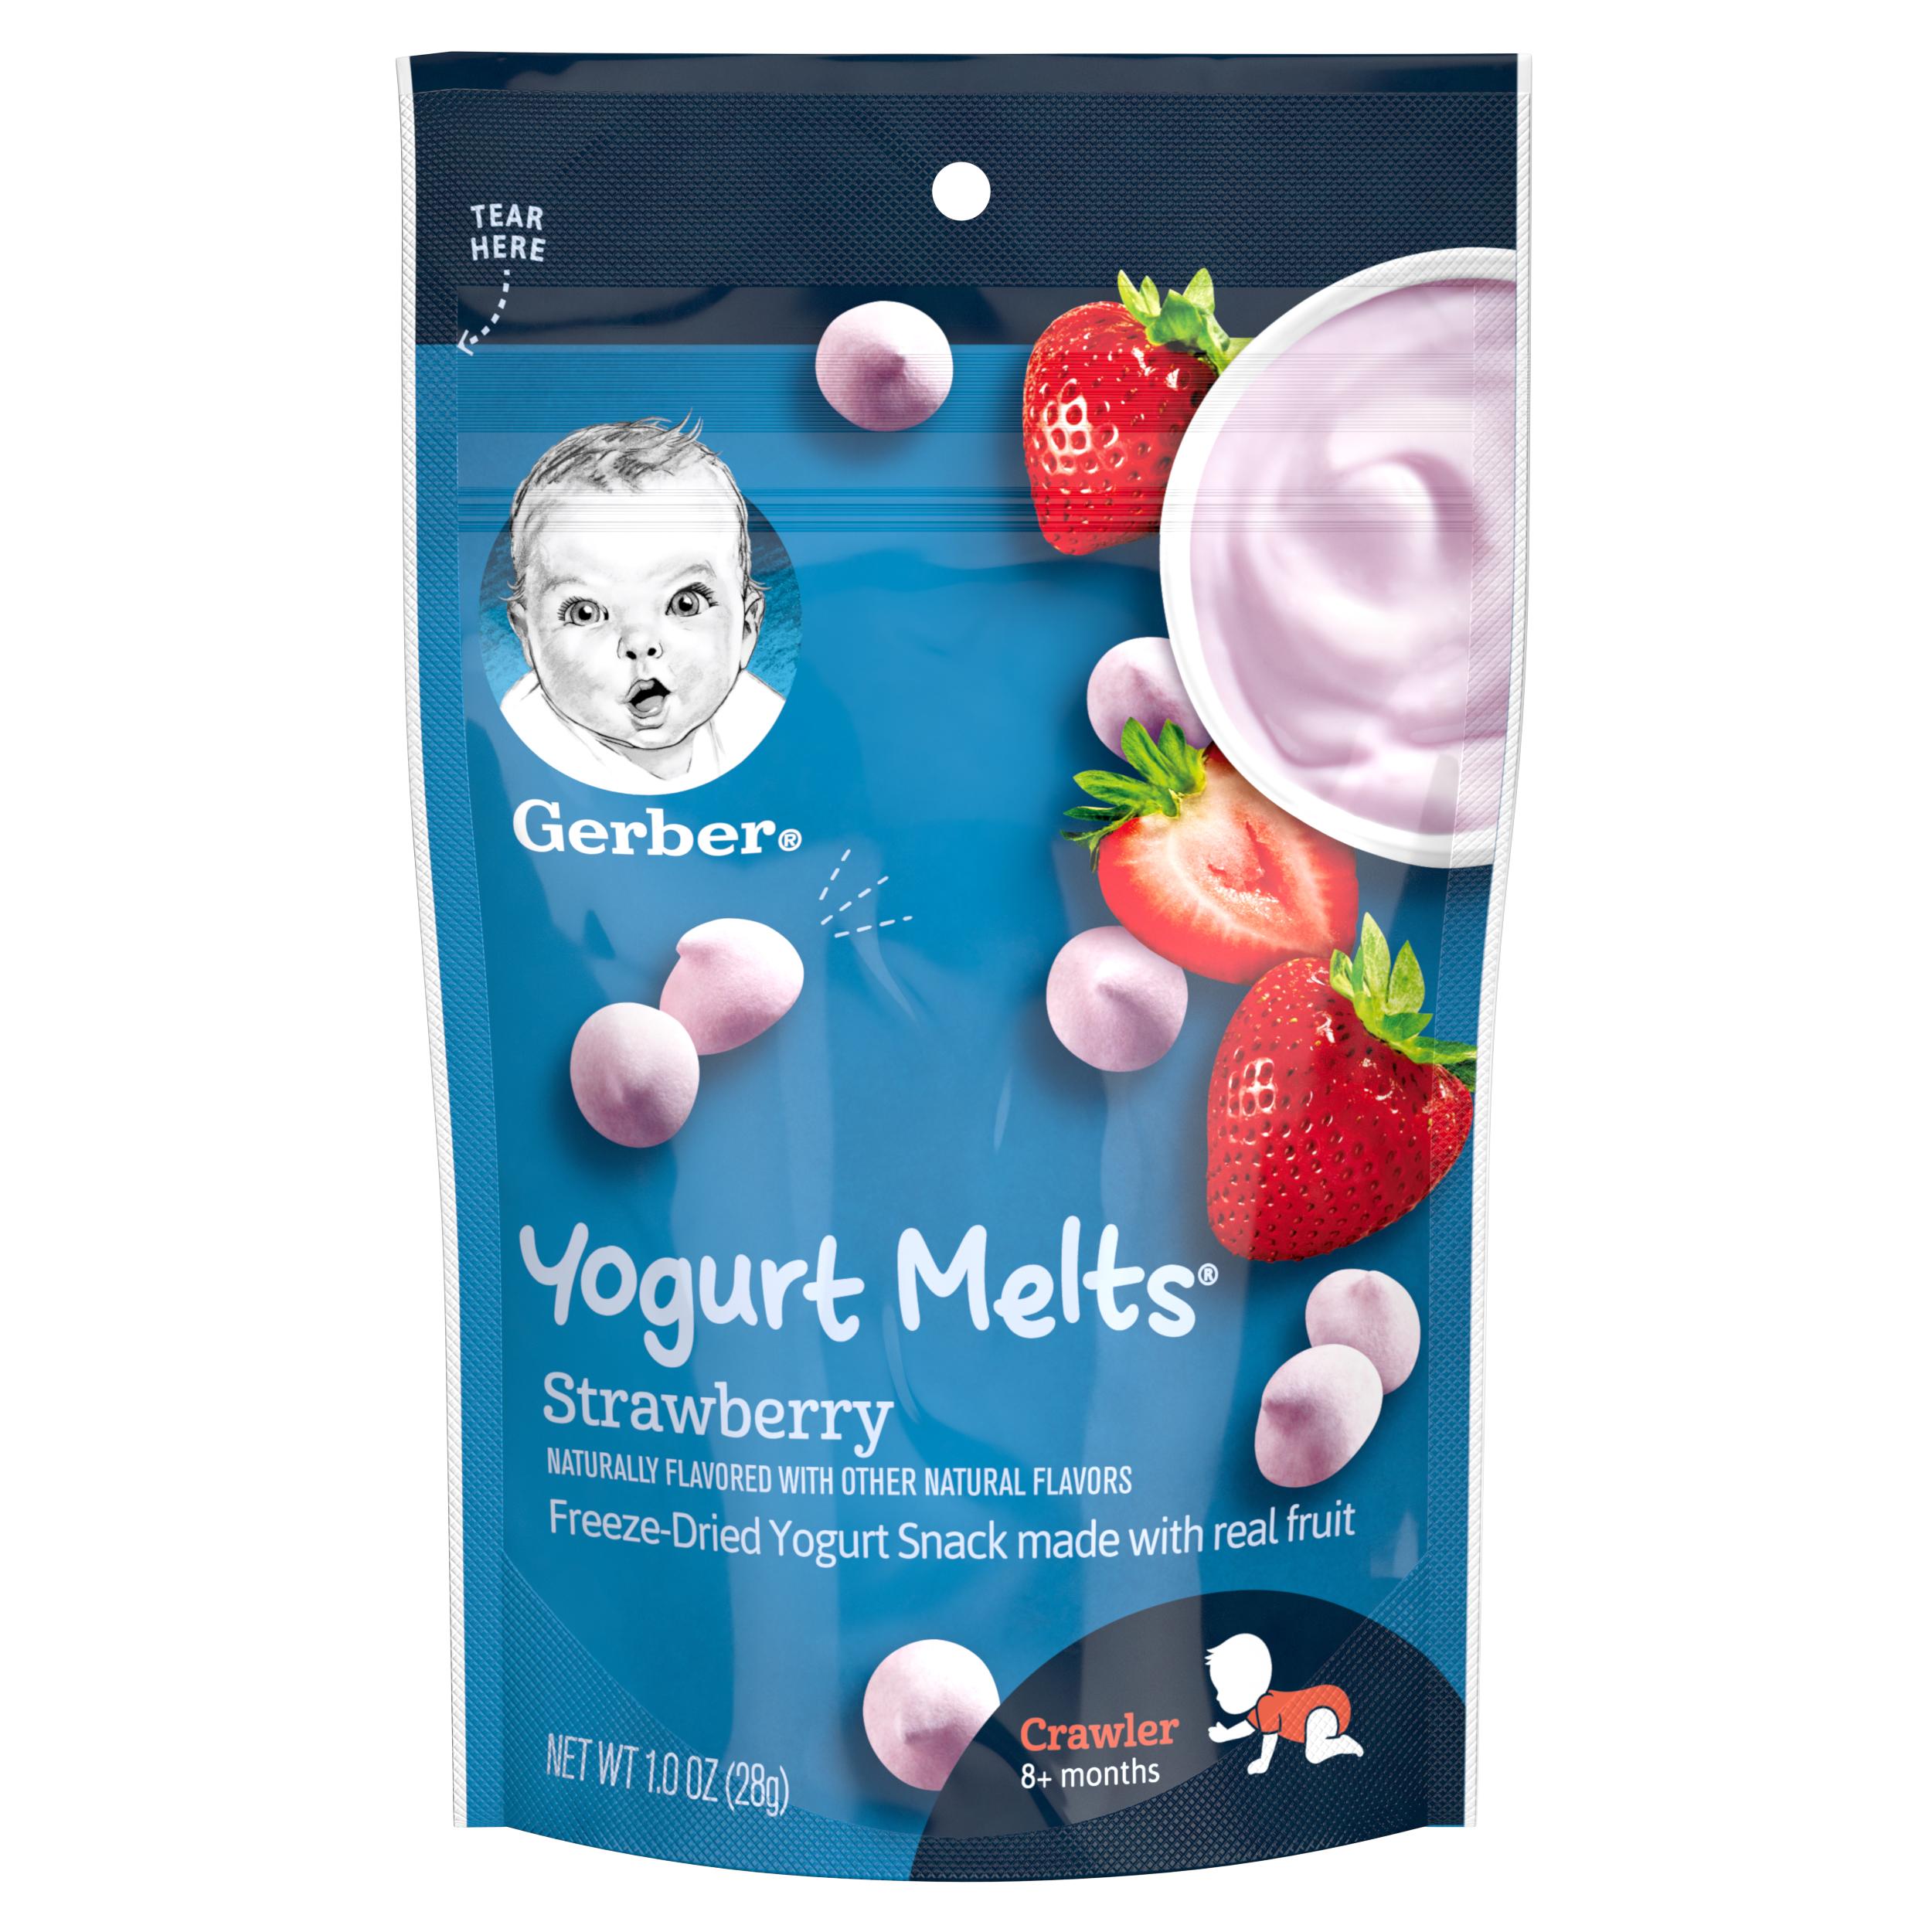 Gerber Graduates Yogurt Melts Freeze-Dried Yogurt & Fruit Snacks, Strawberry, 1 oz